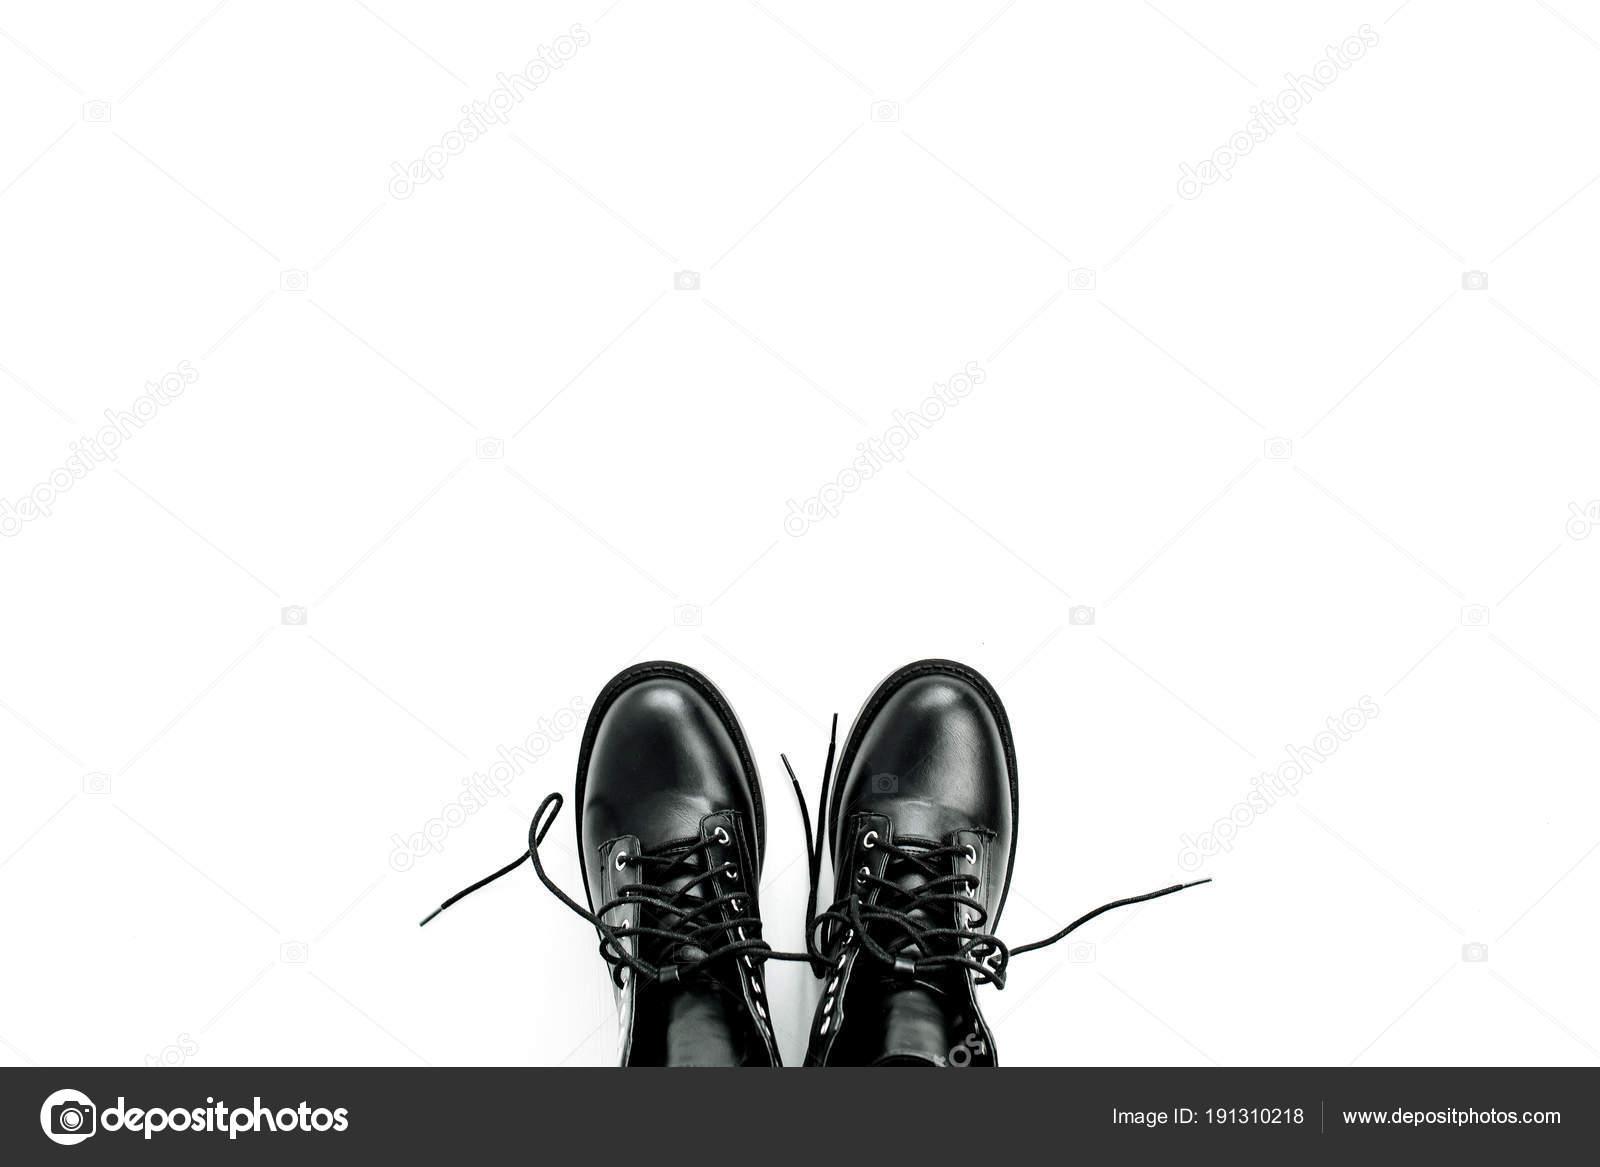 00745dab535 depositphotos_191310218-stockafbeelding-vrouw-mode-plat-lag-bovenaanzicht.jpg